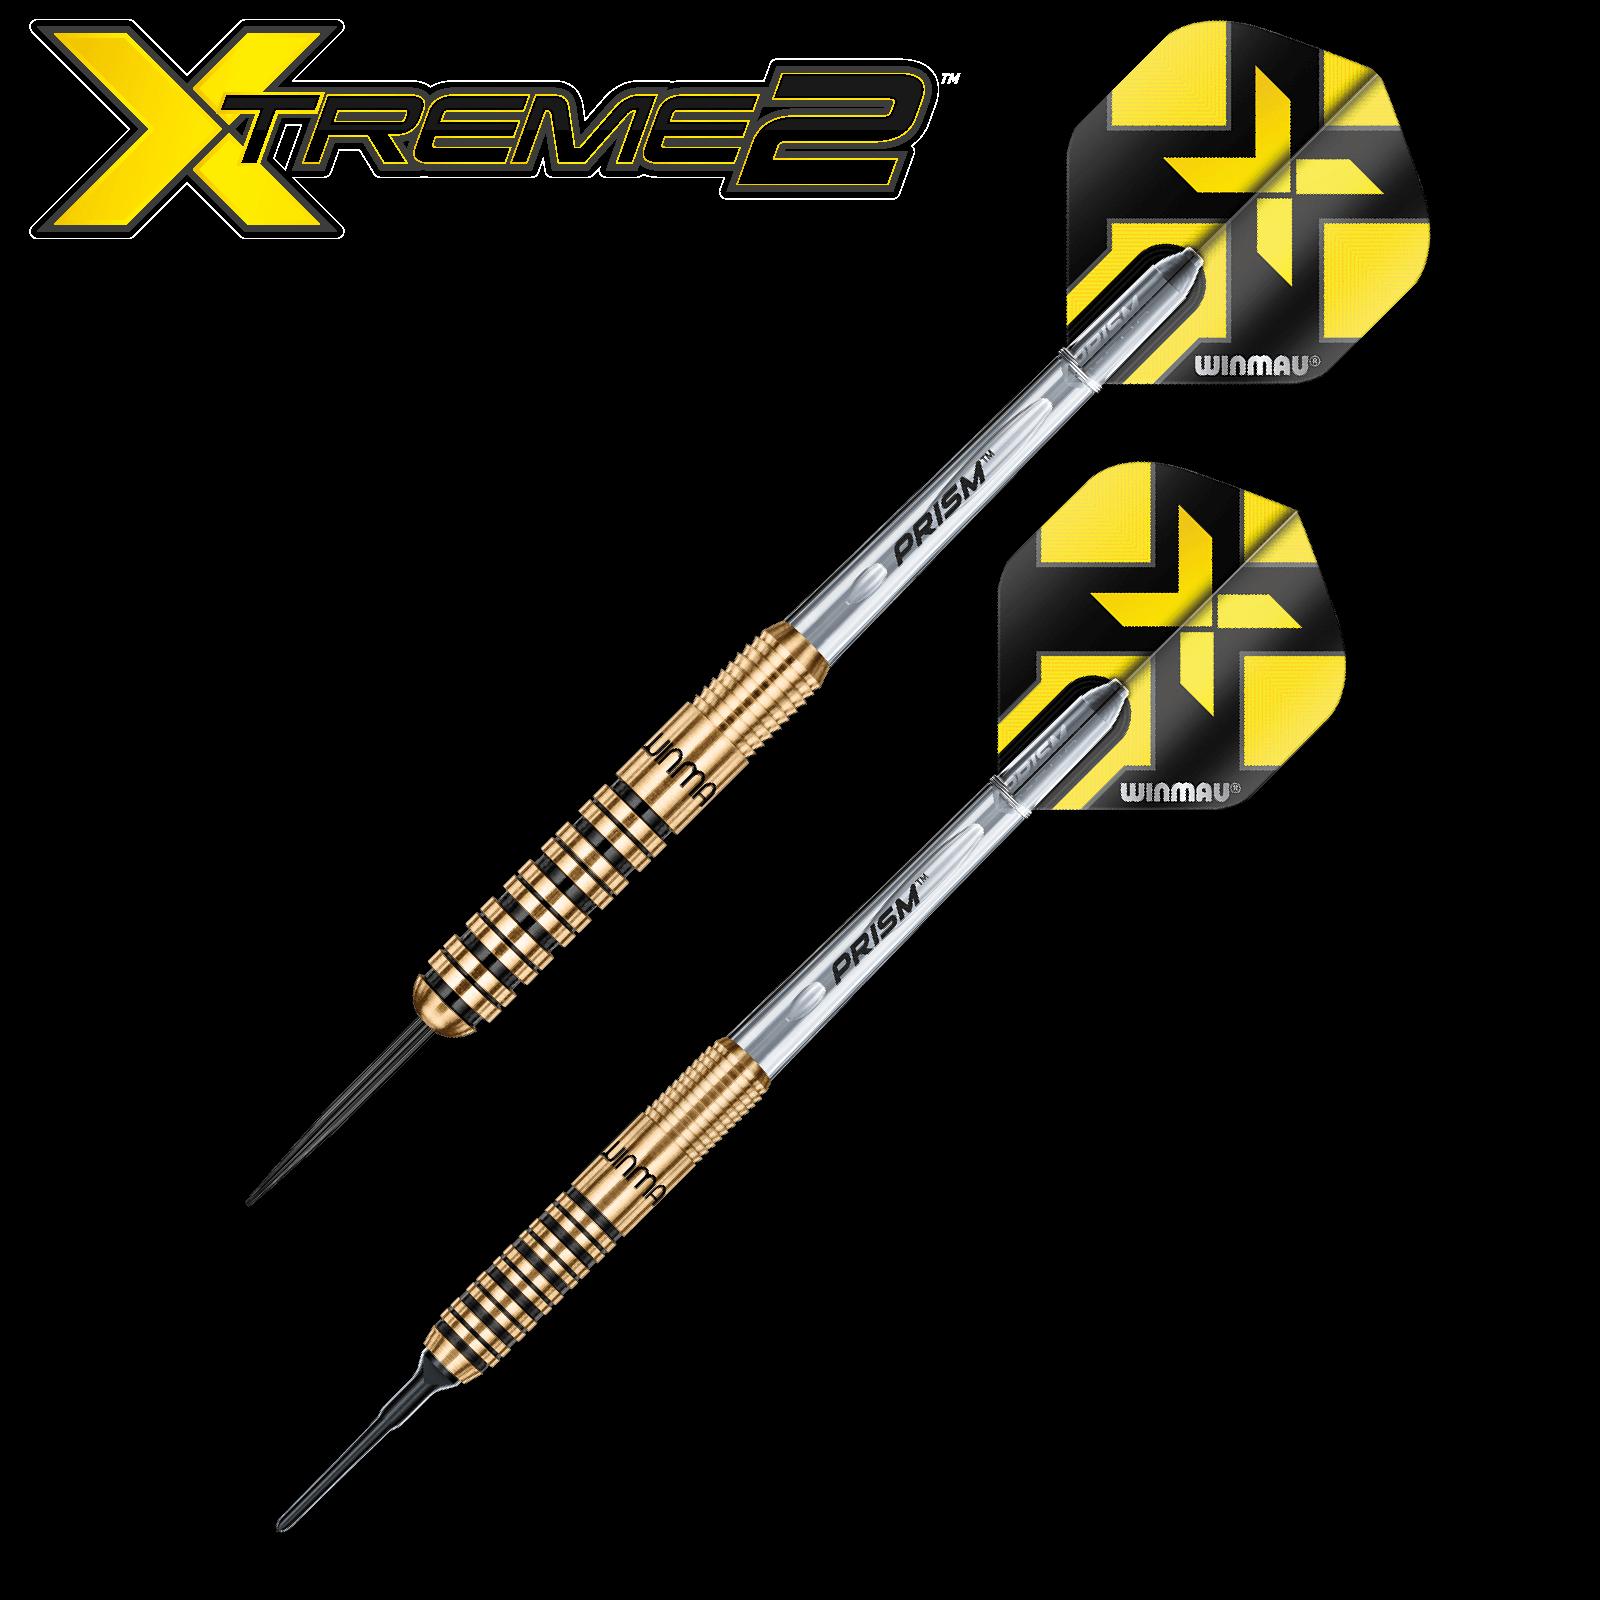 Xtreme2